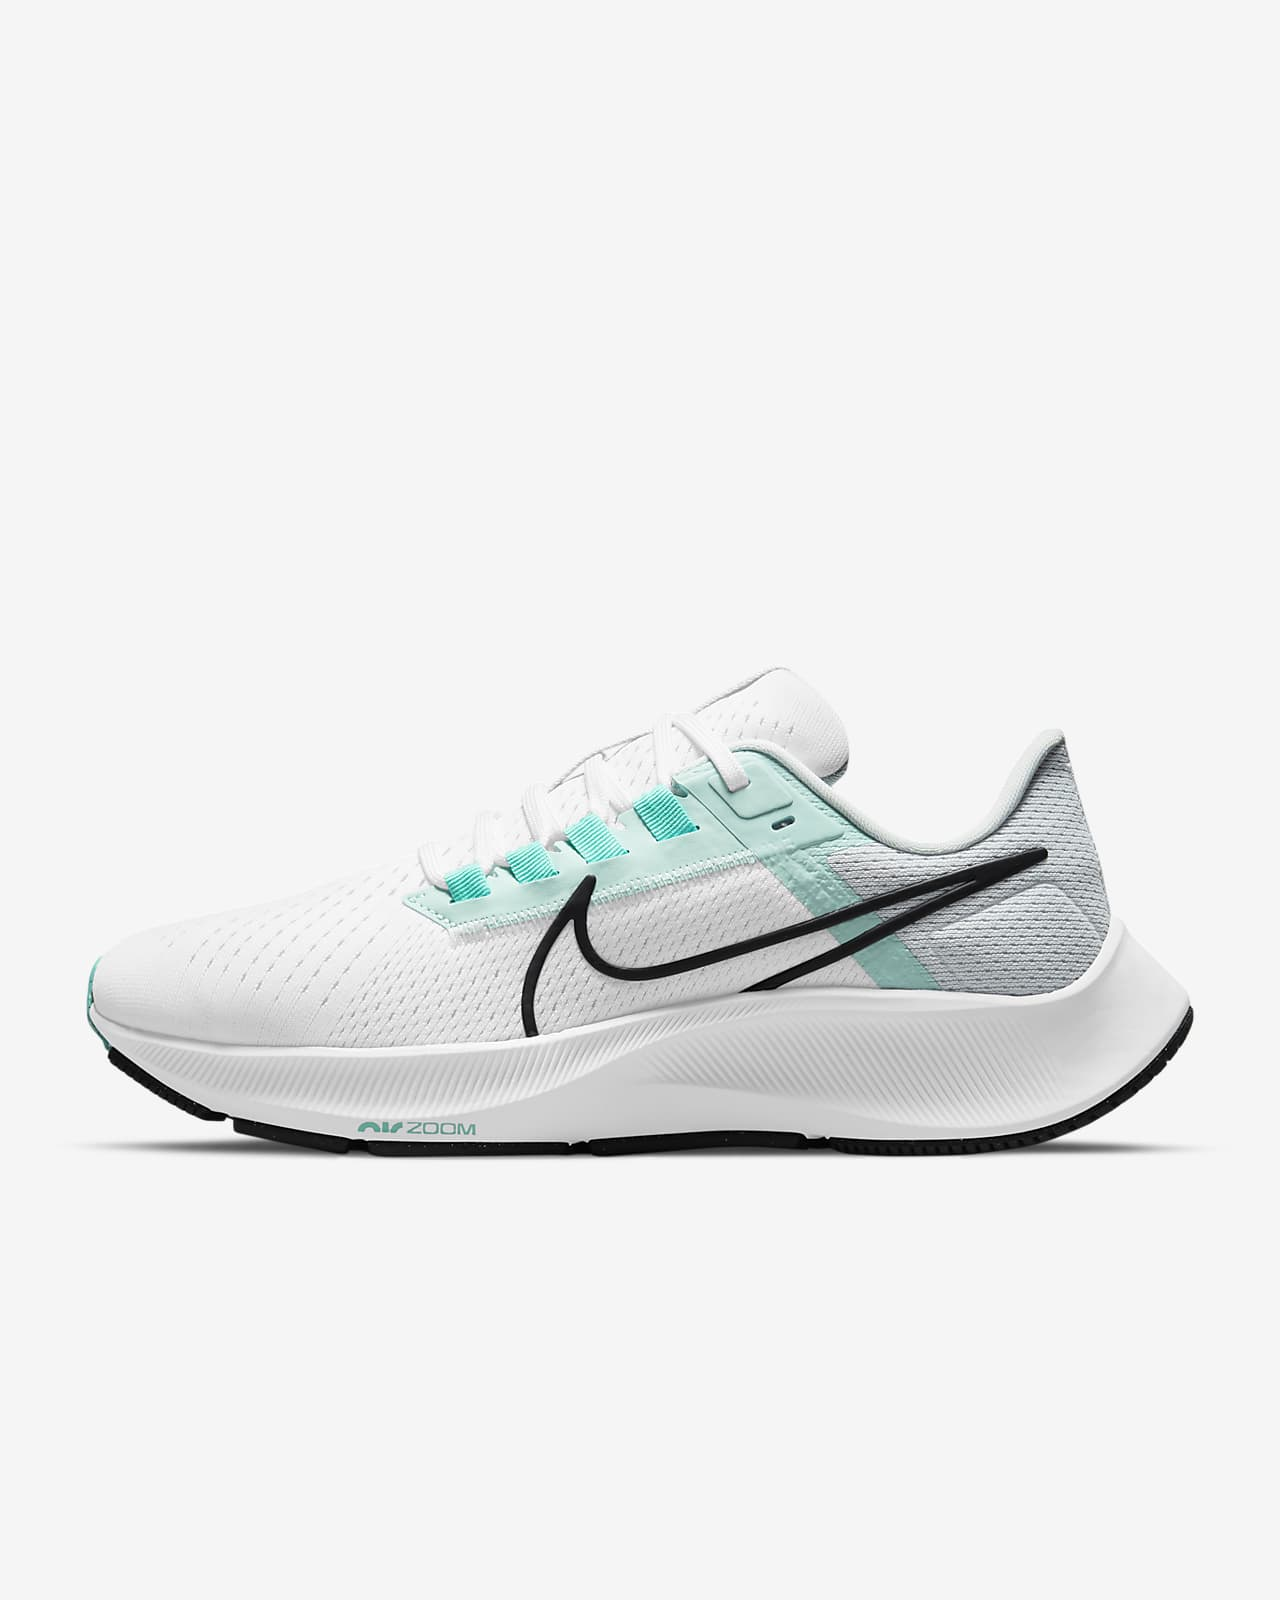 Calzado de running de carretera para mujer Nike Air Zoom Pegasus 38